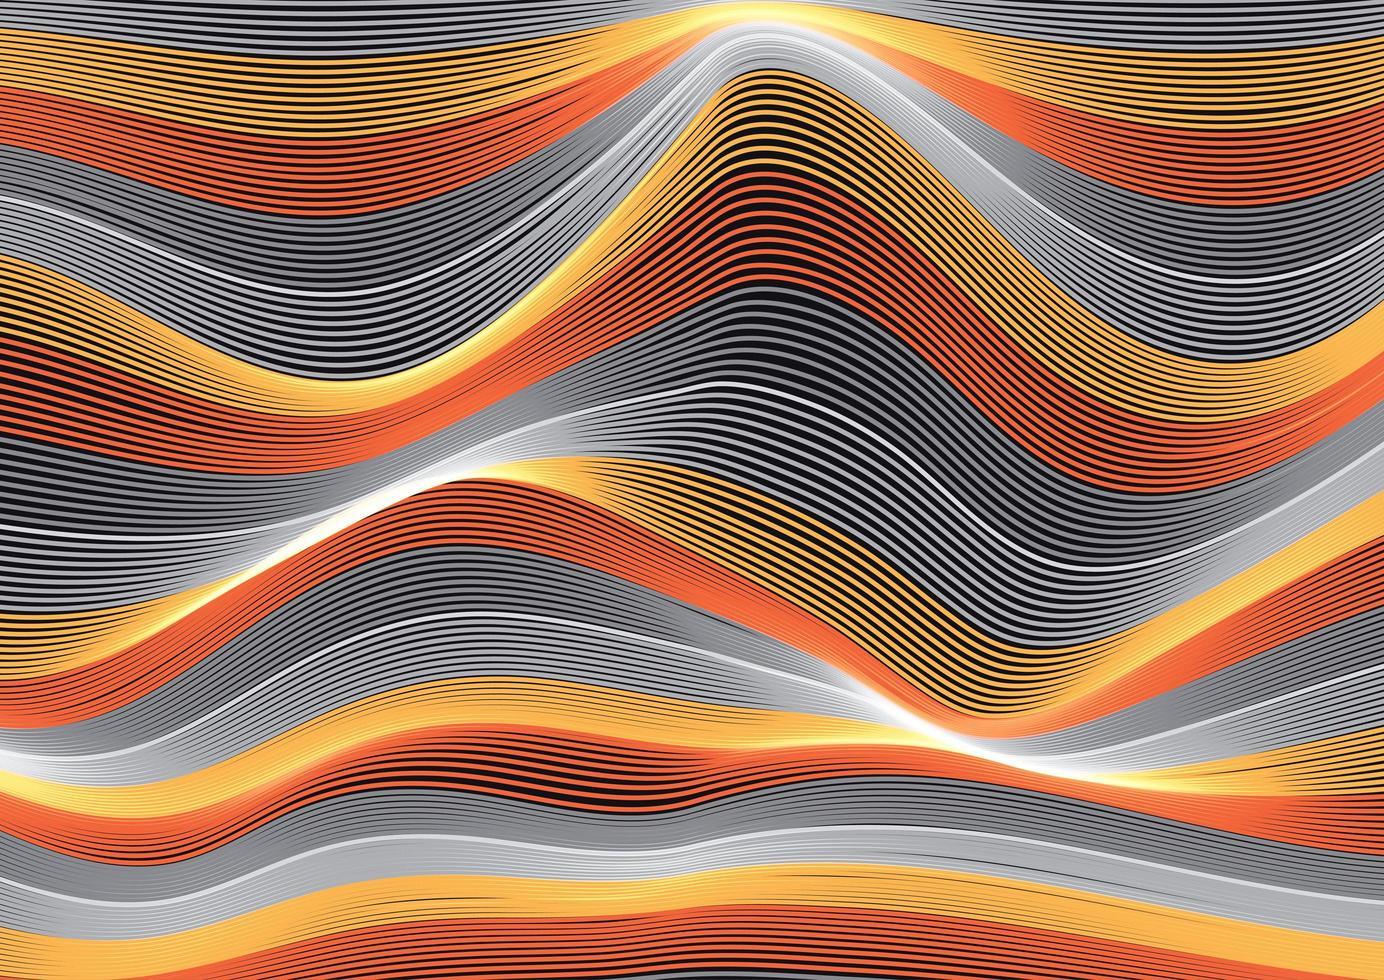 linee fluide onda vettore